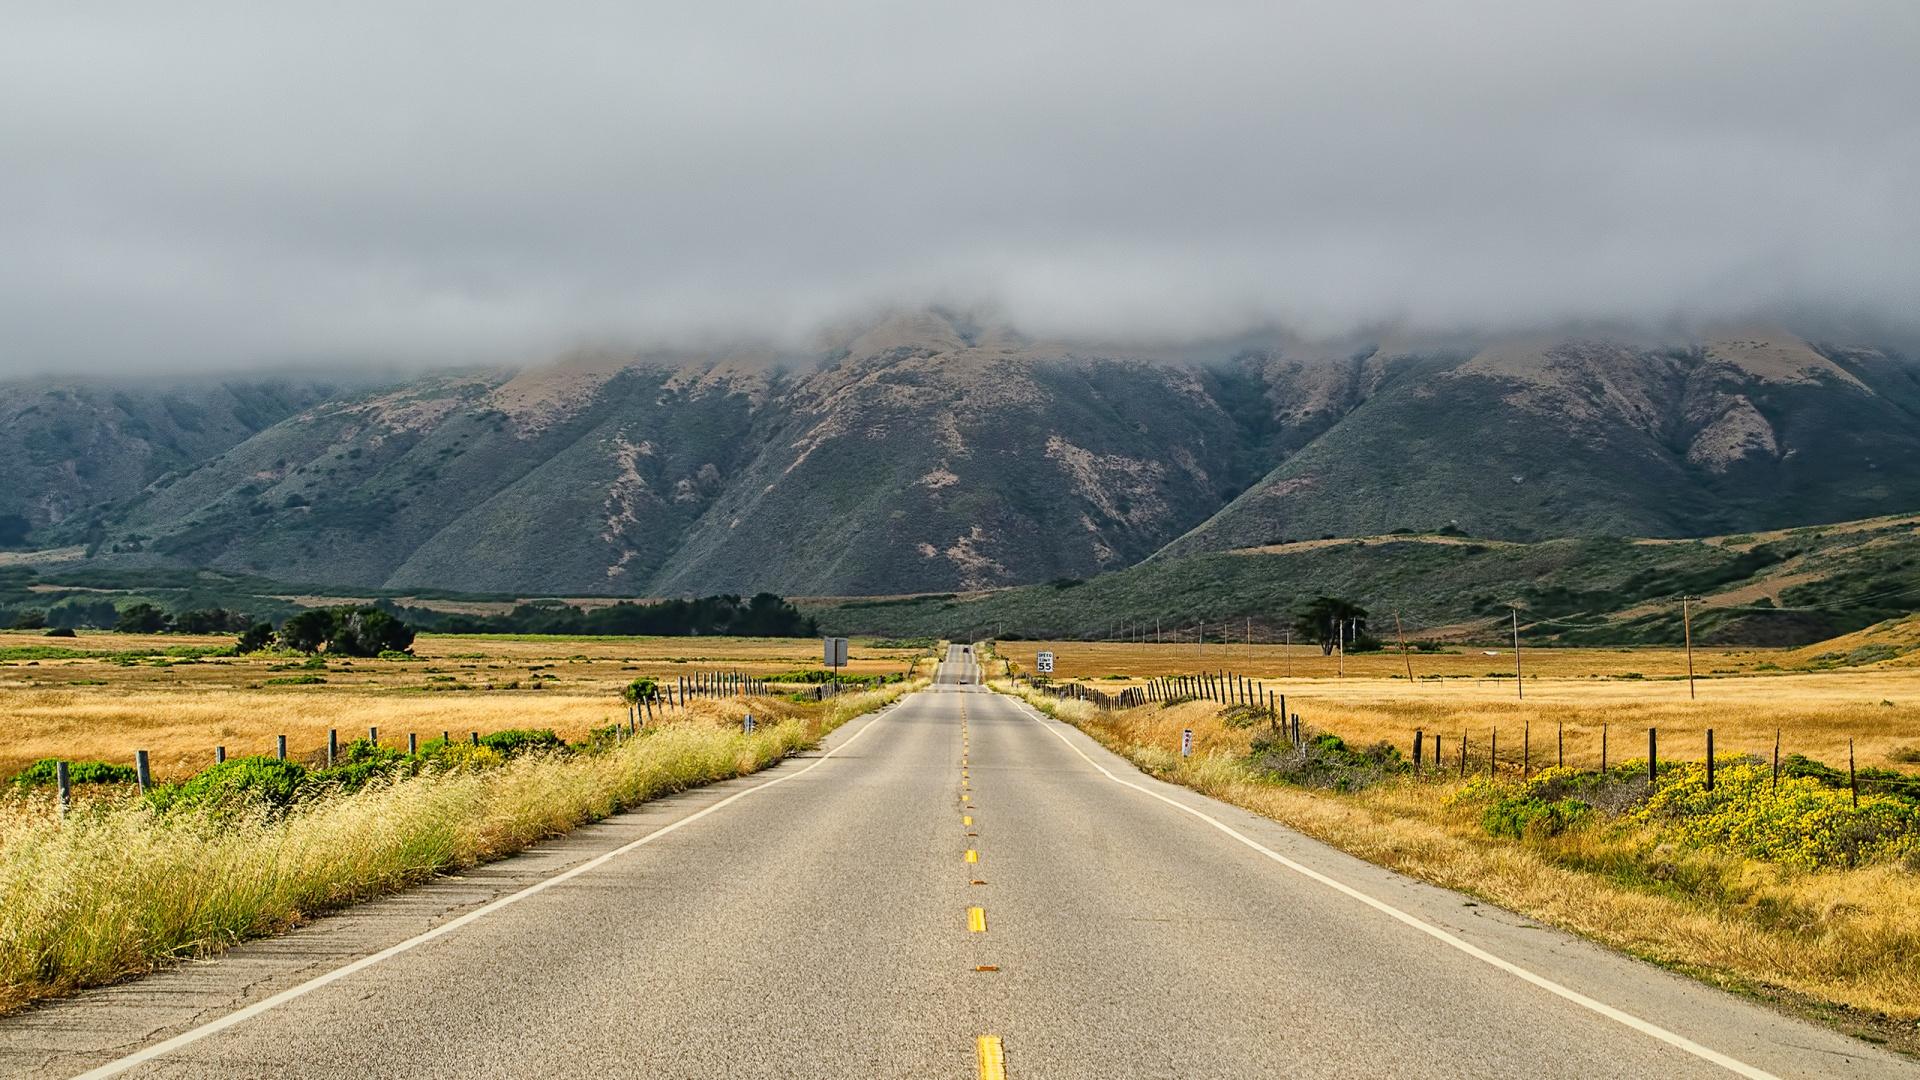 California Landscape Road   Full HD Desktop Wallpapers 1080p